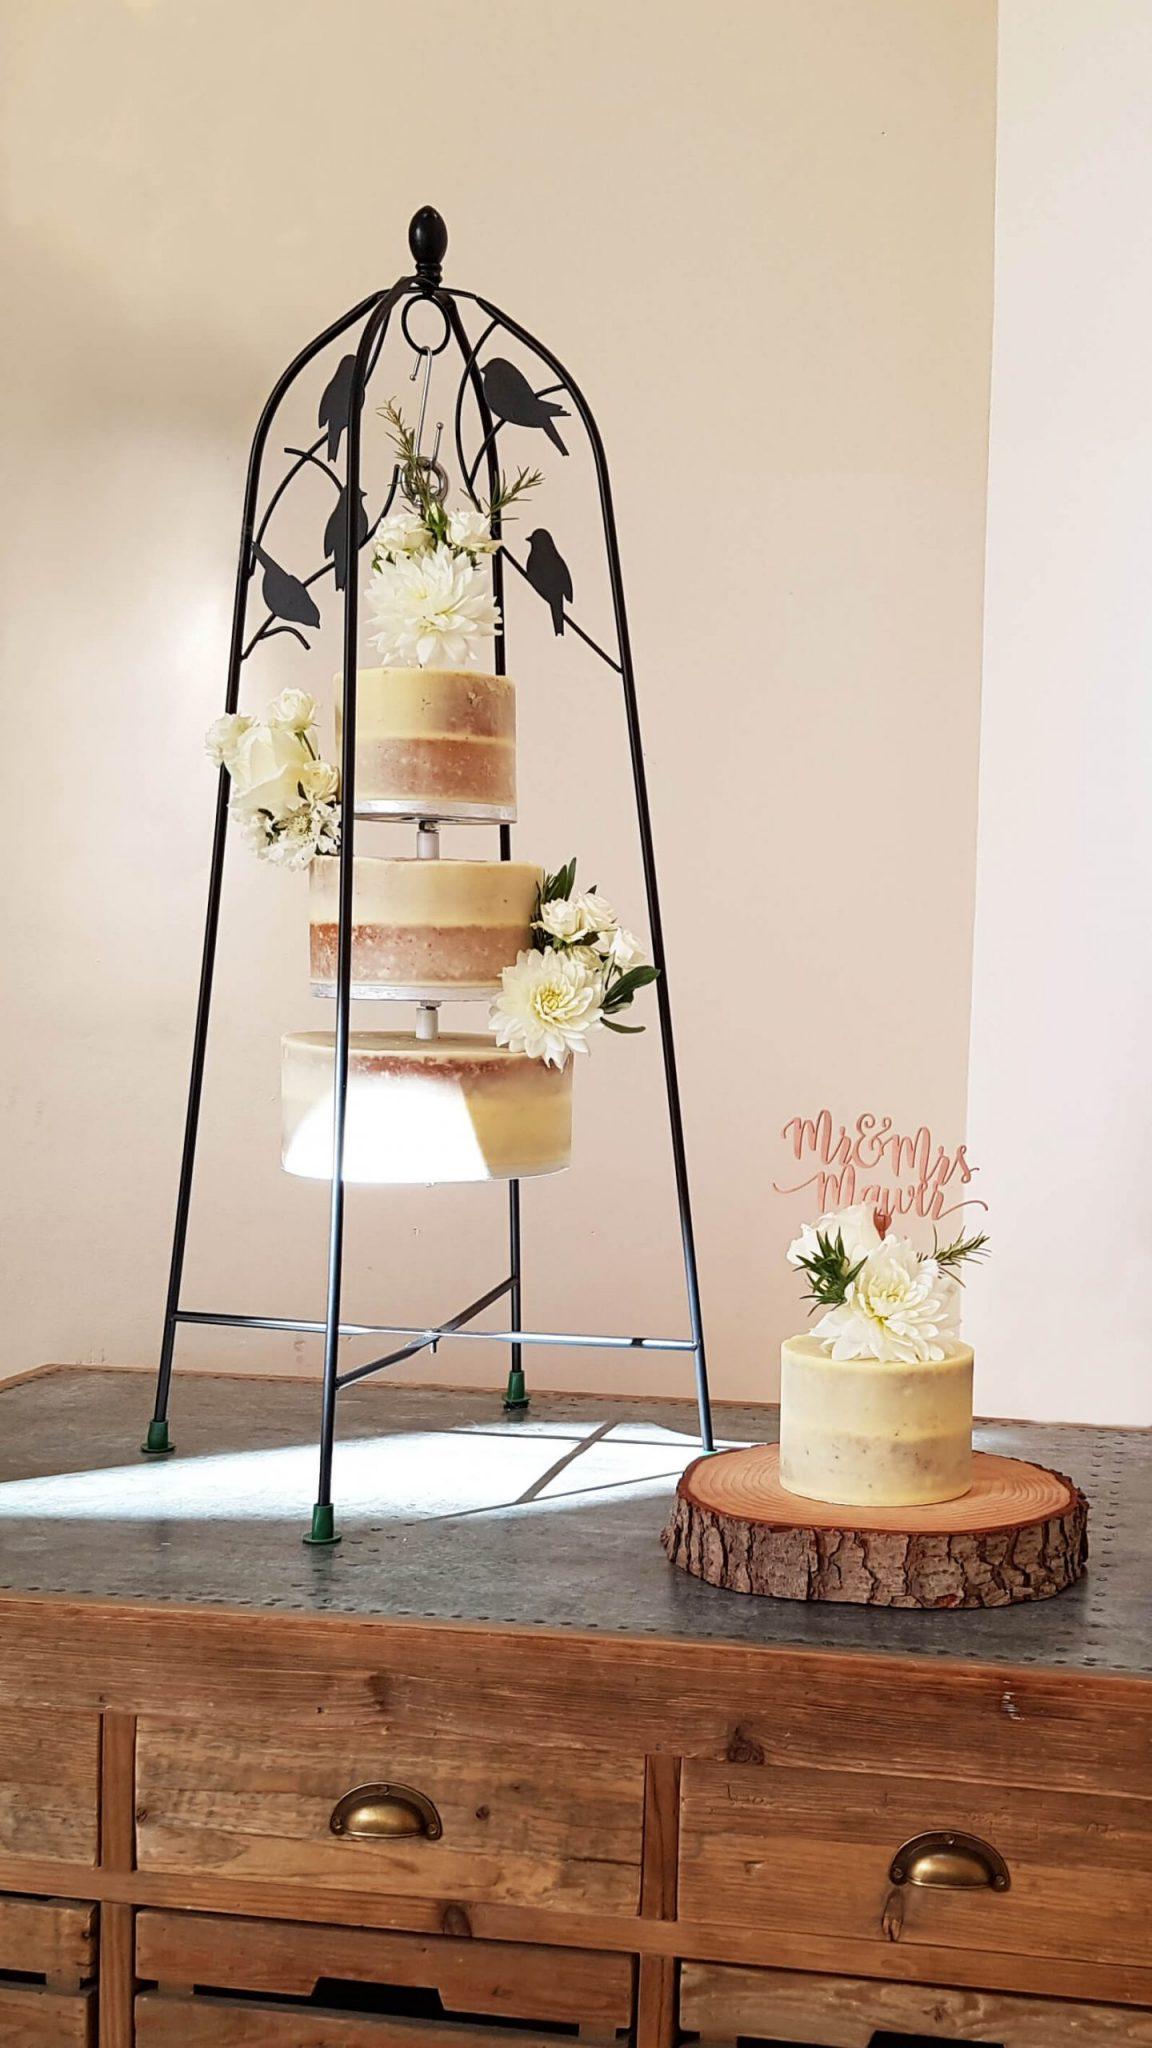 Hanging Wedding Cakes in Surrey - Semi-Naked Wedding Cakes - Millbridge Court - Farnham - Love from Lila